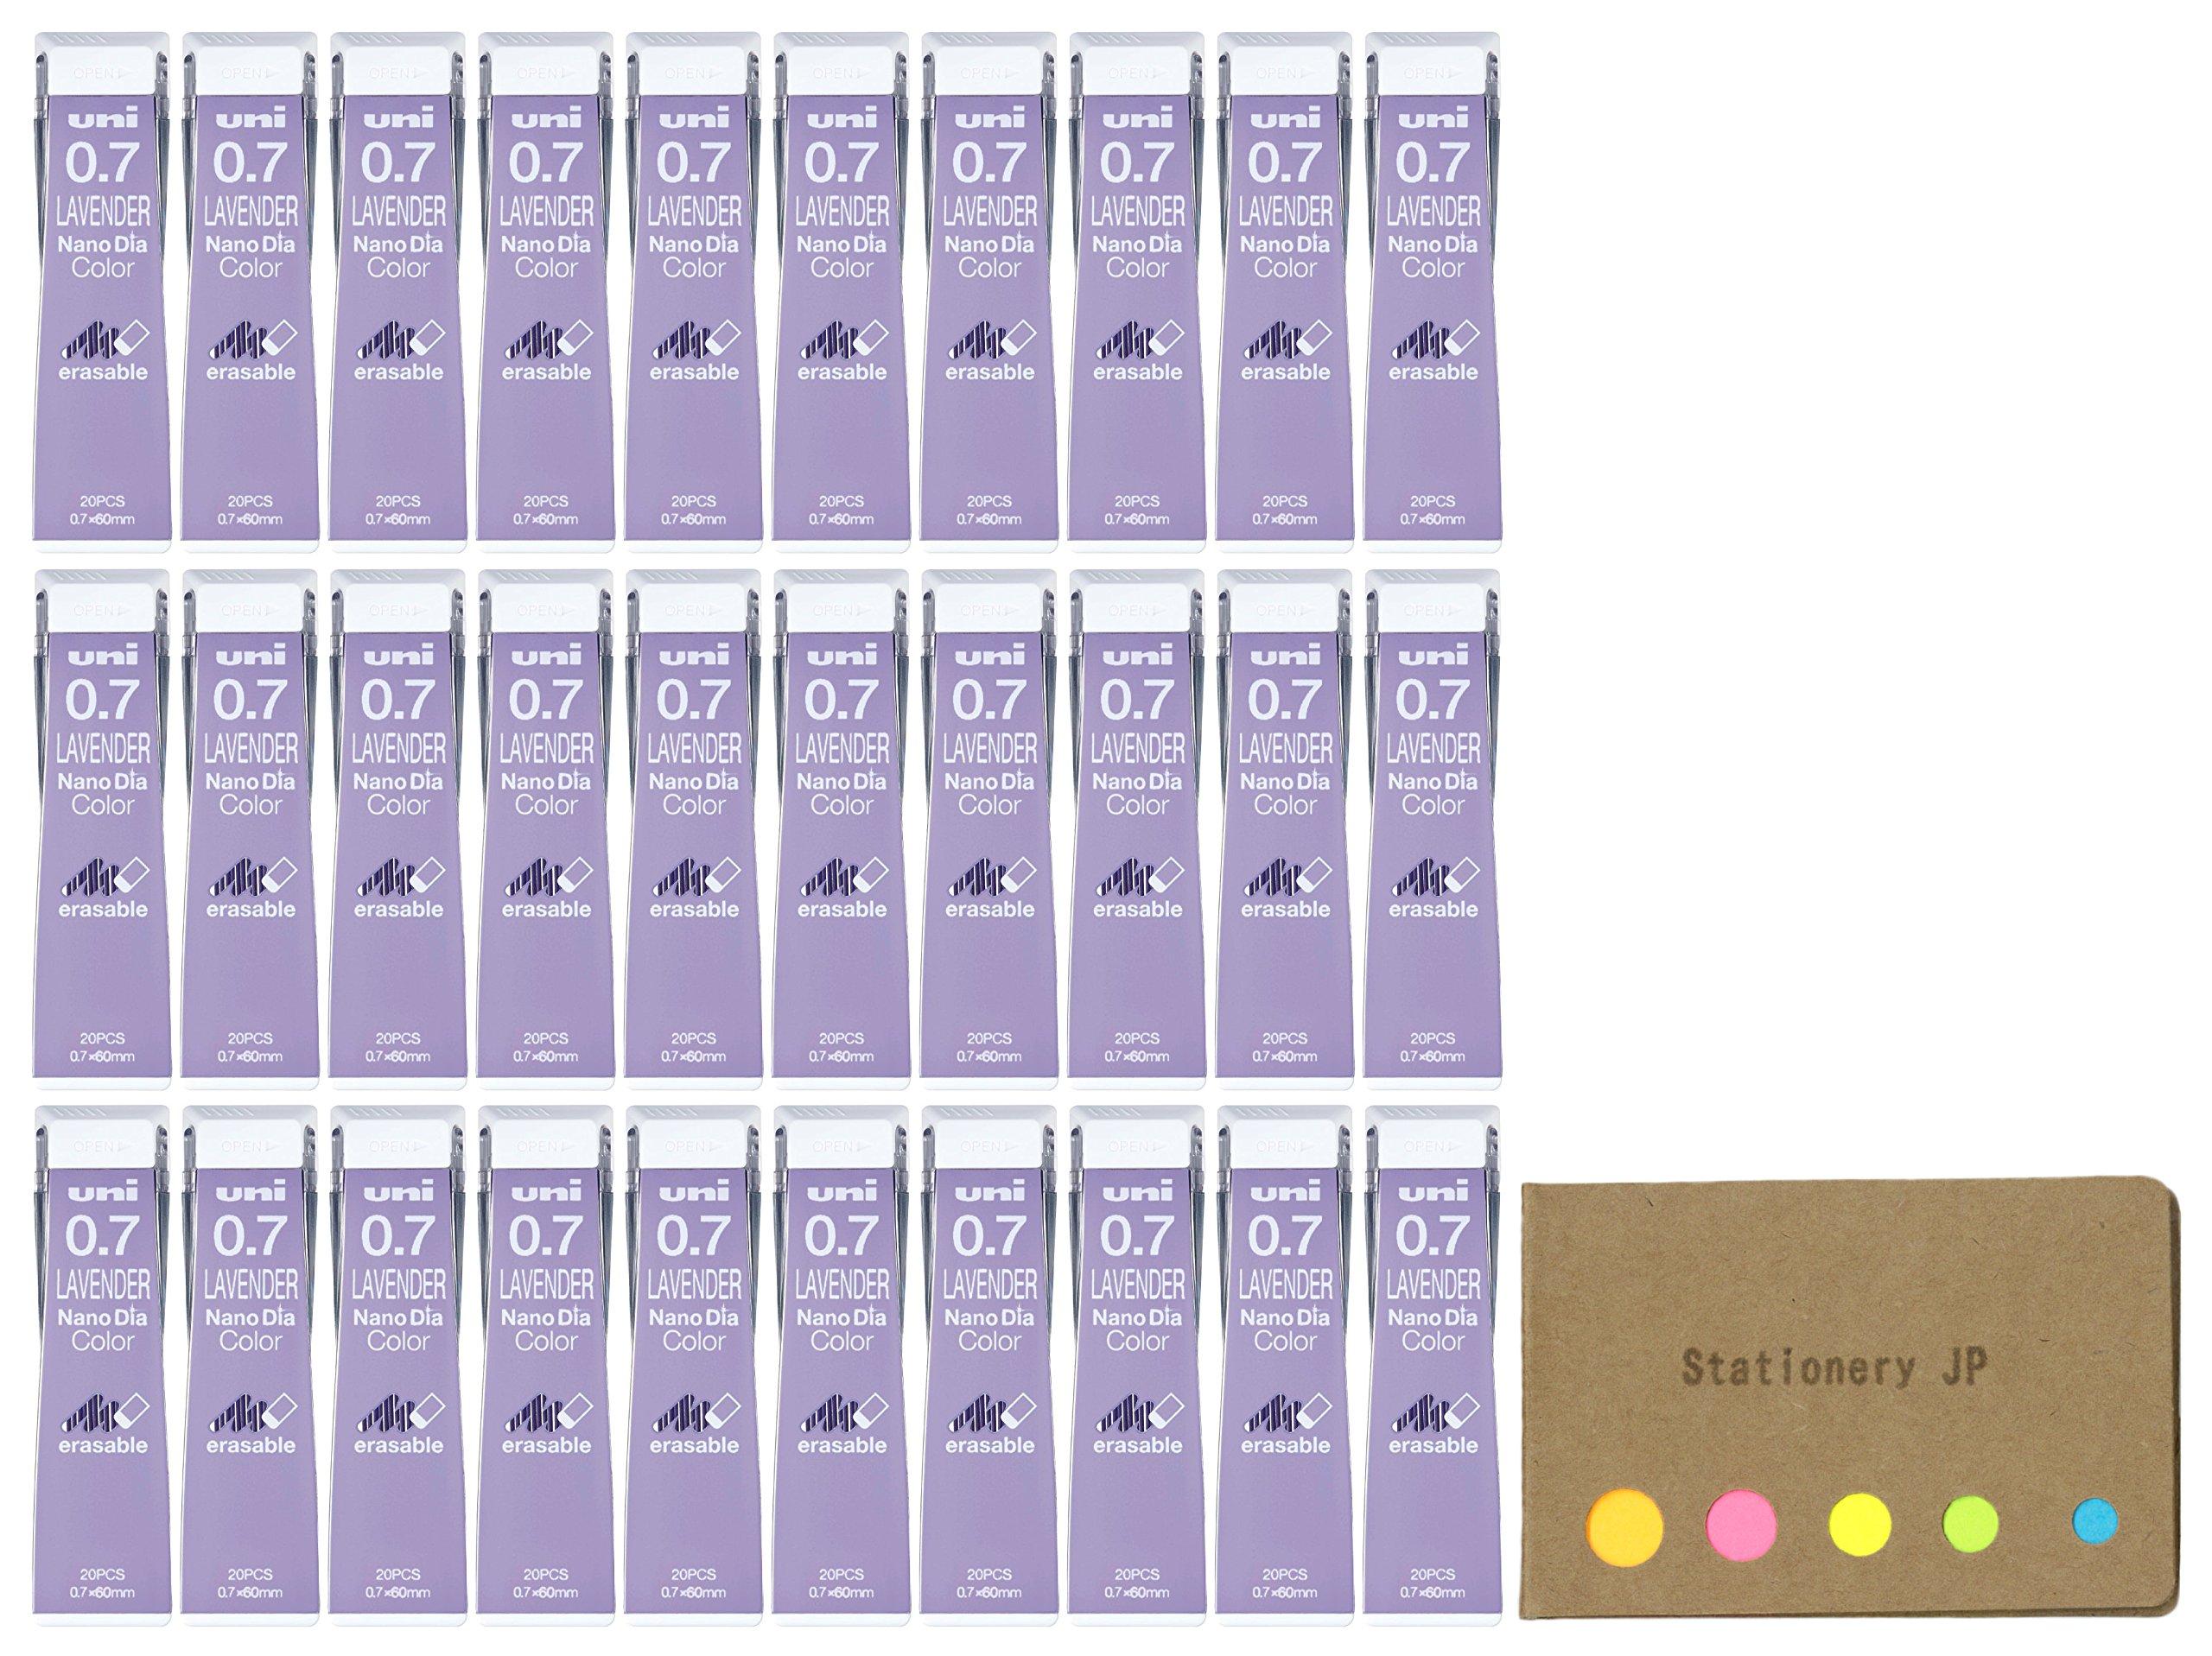 Uni NanoDia Color Mechanical Pencil Leads, 0.7mm, Lavender, 30-pack/total 600 Leads, Sticky Notes Value Set